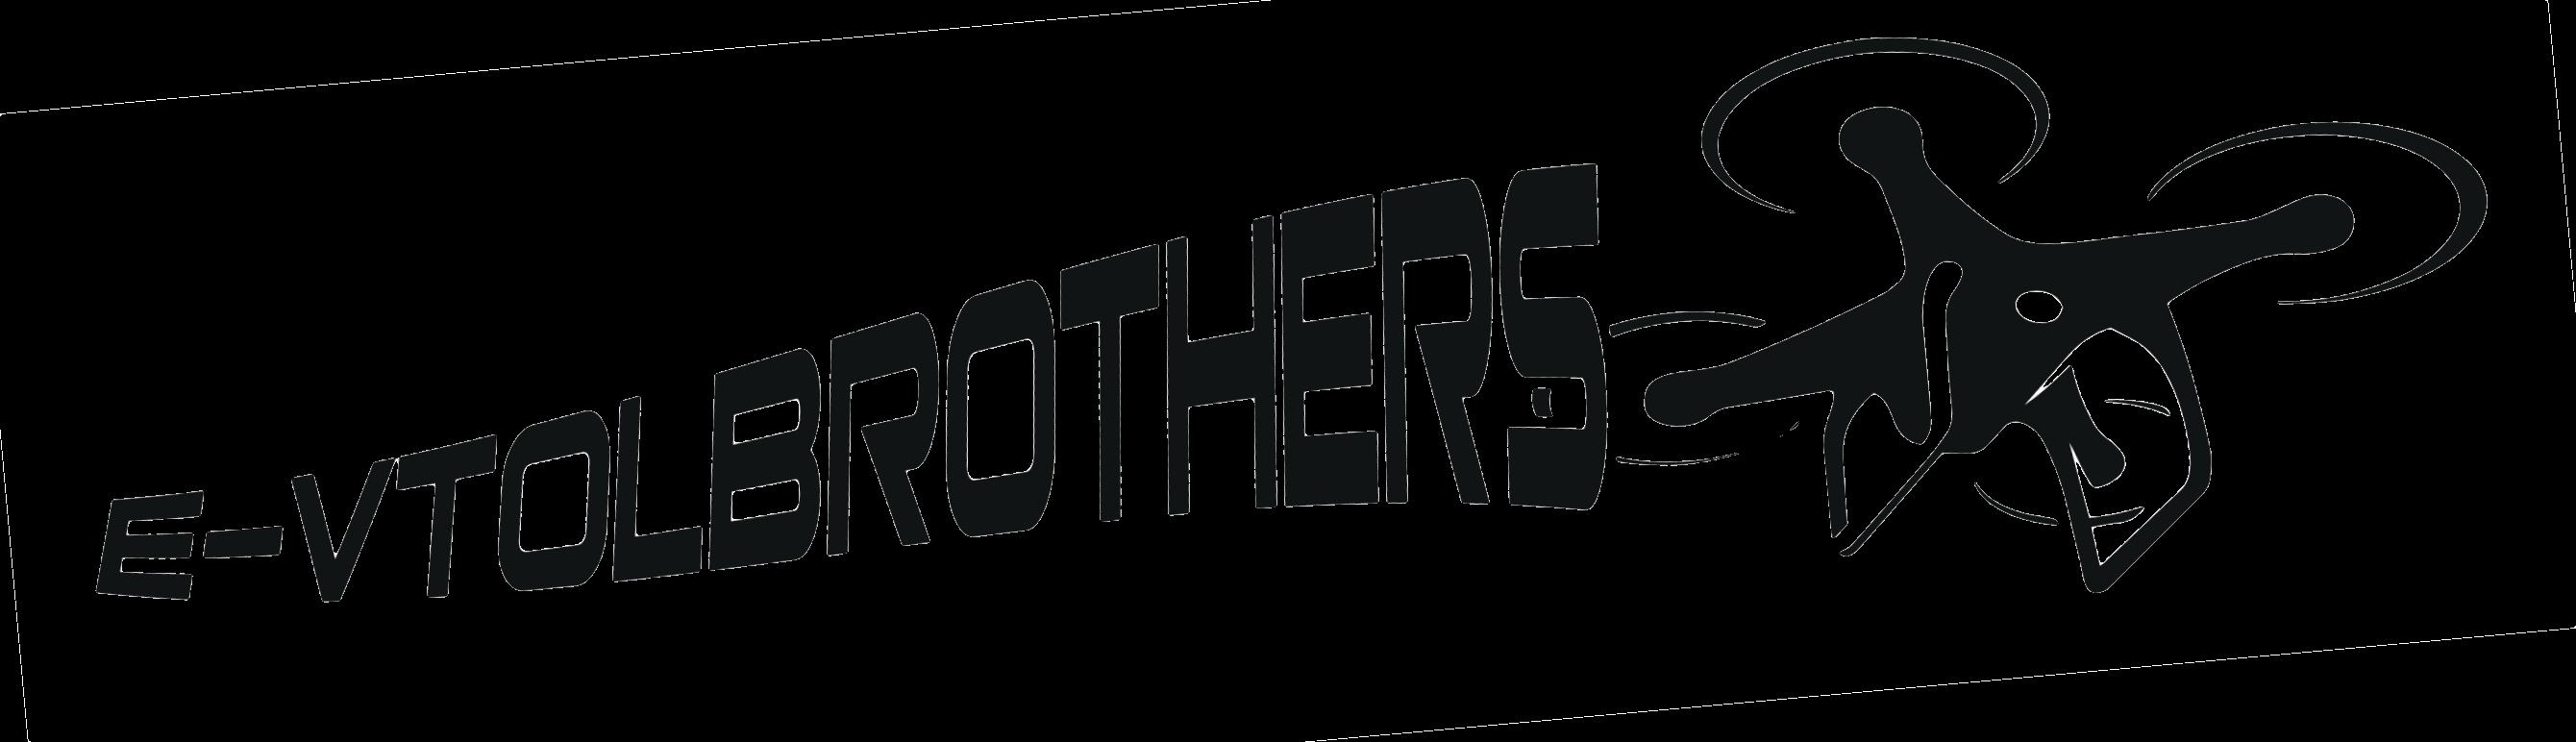 E-Vtolbrothers